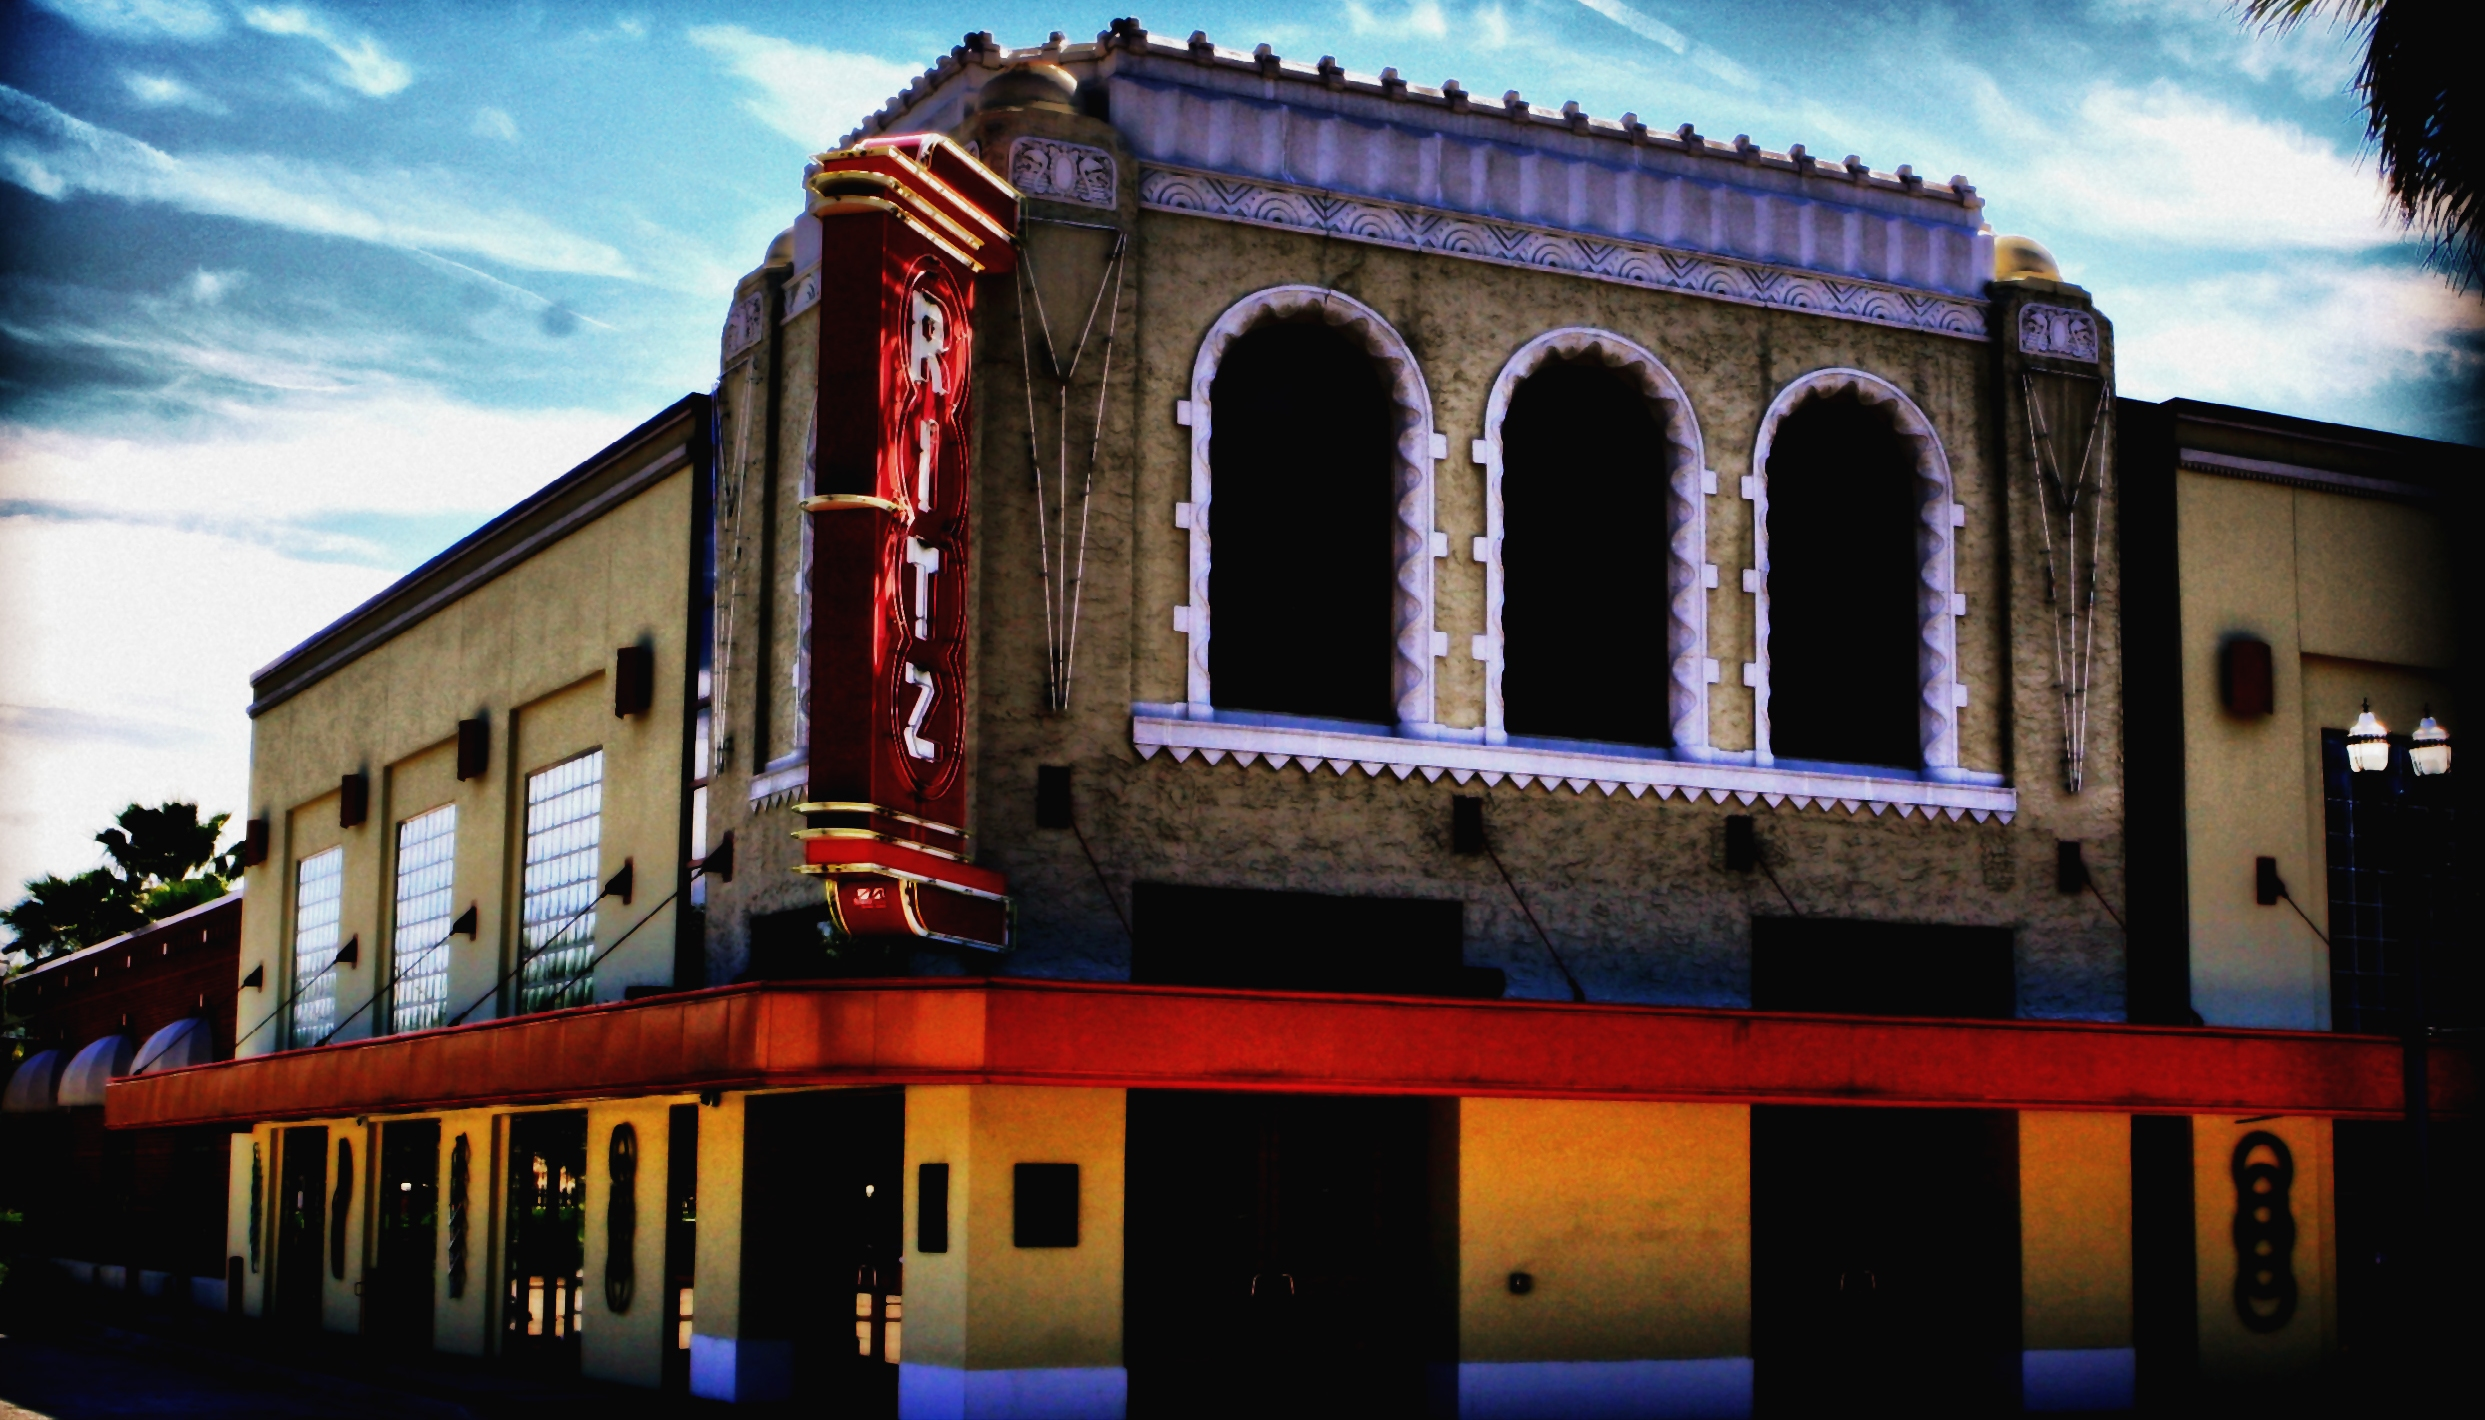 Pieces of a Dream / Joy Dennis – The Ritz Theater (Lavilla)